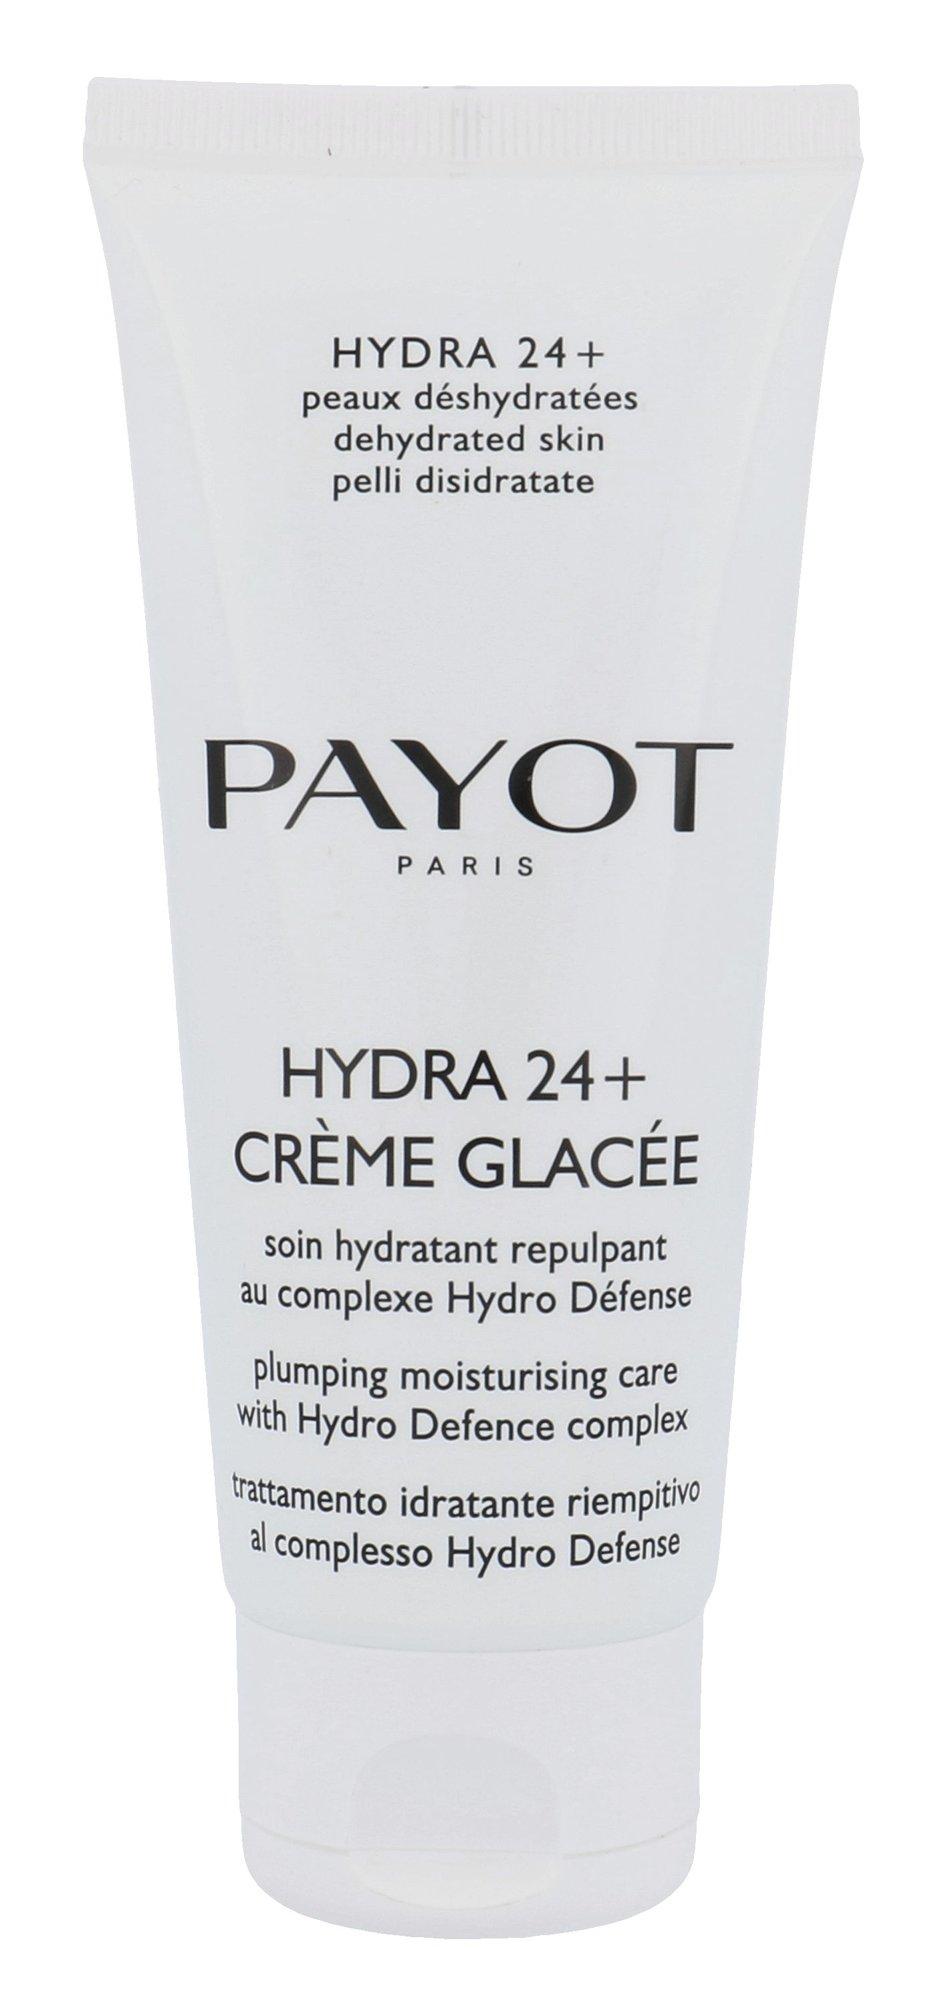 PAYOT Hydra 24+ Cosmetic 100ml